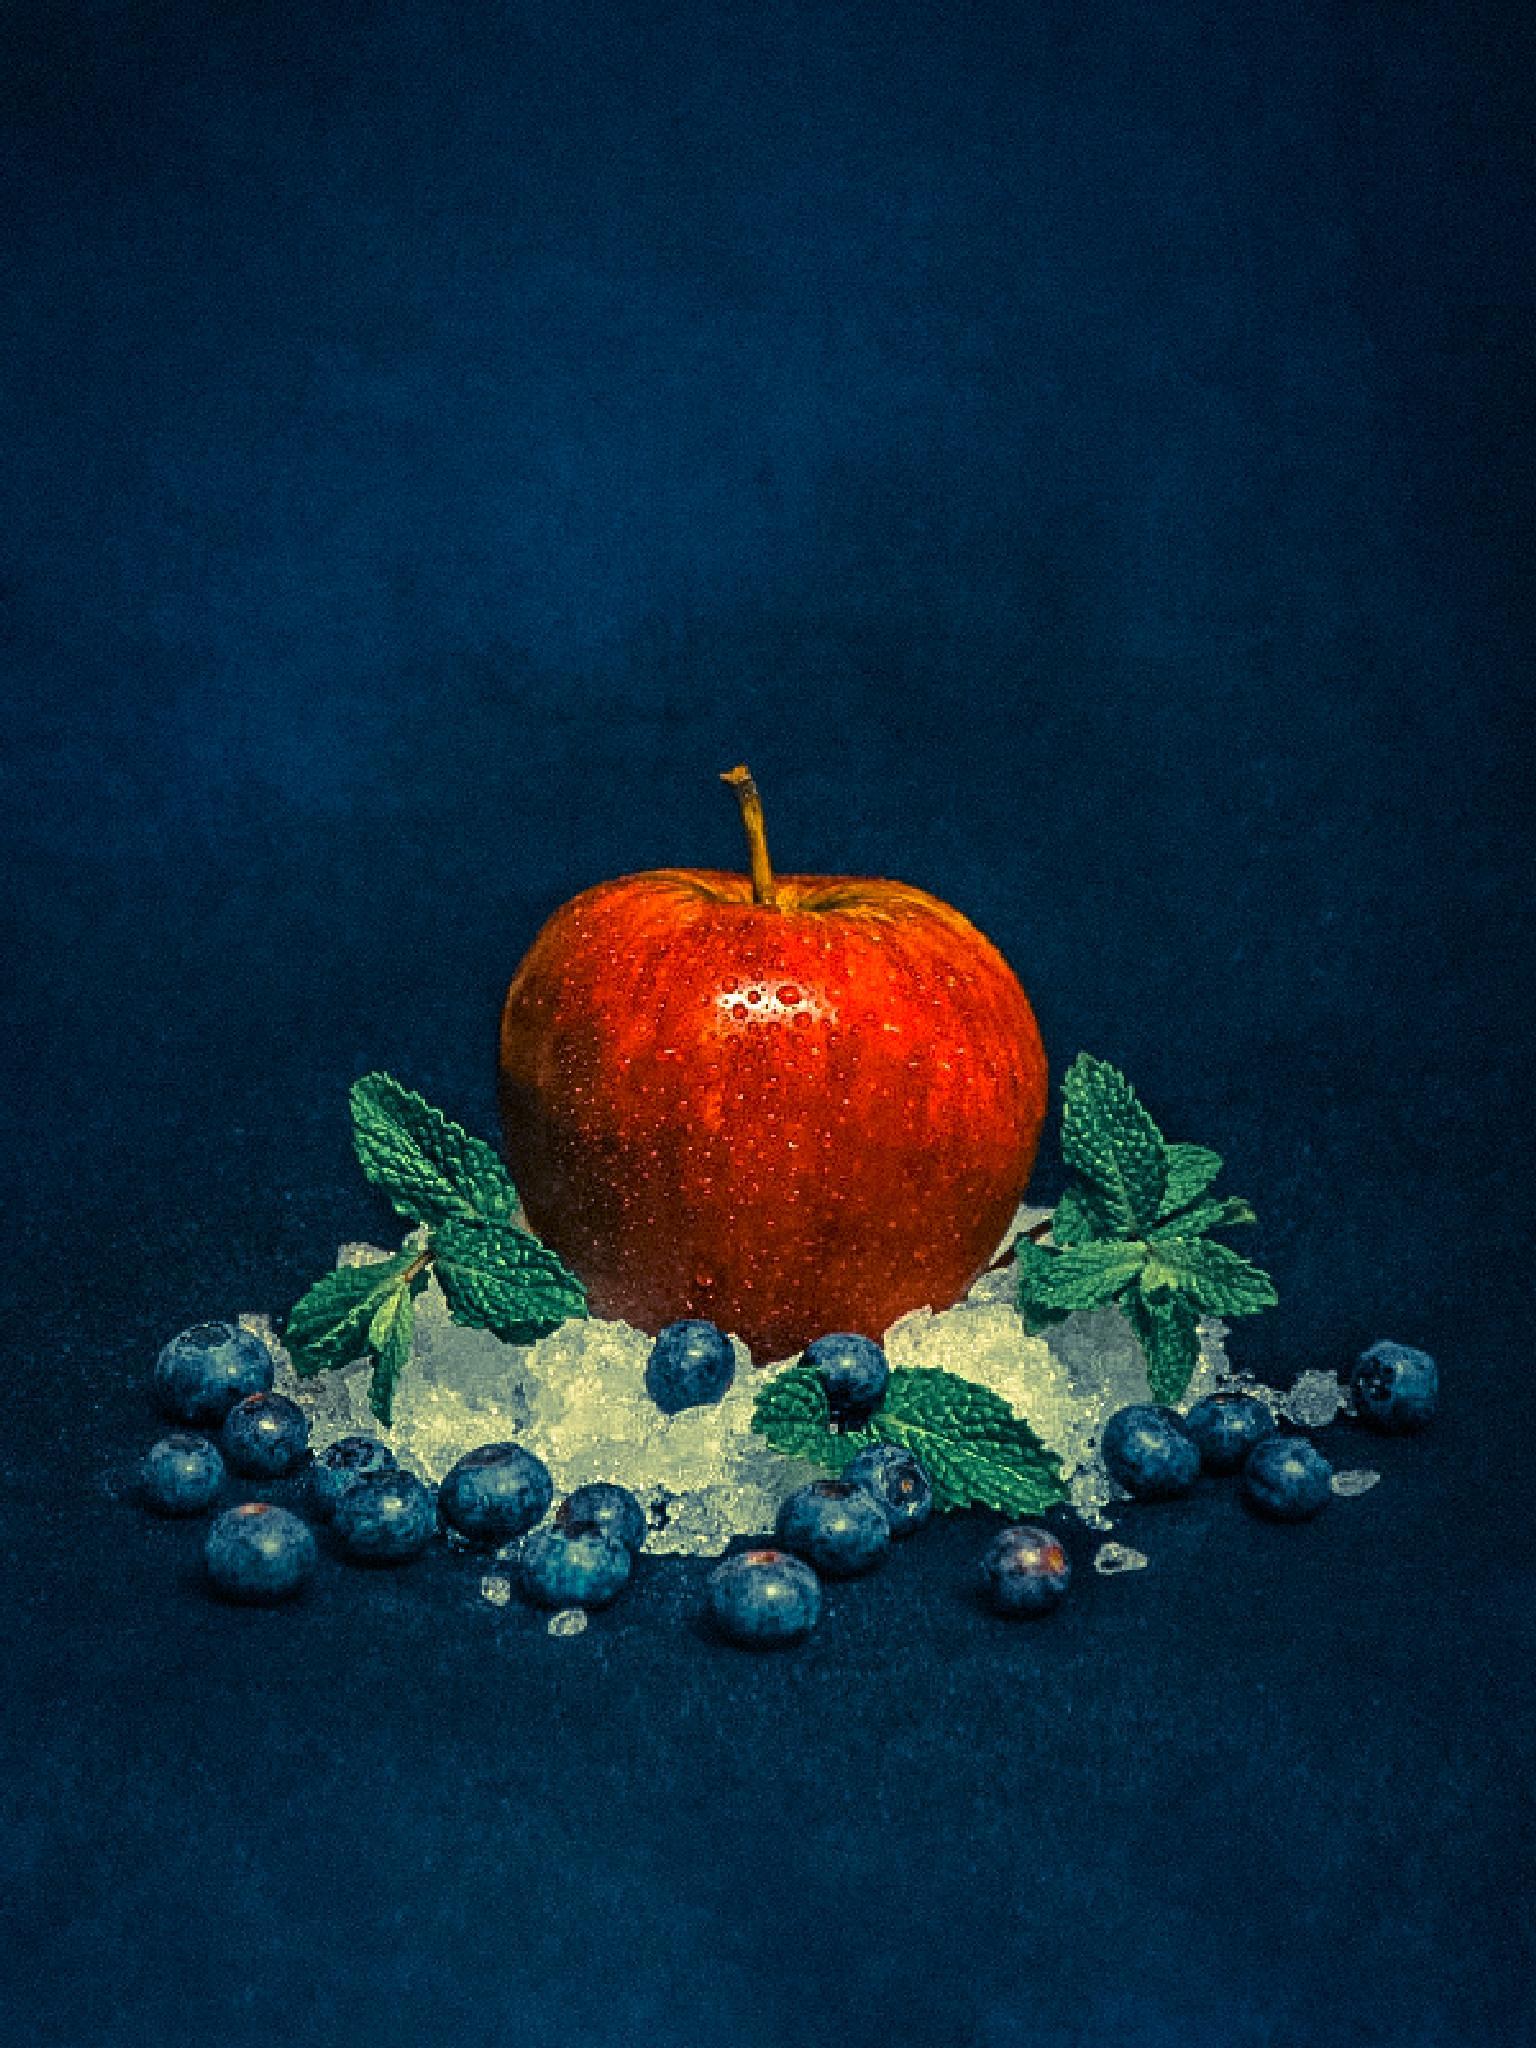 Arty apple by Stephan Du Toit